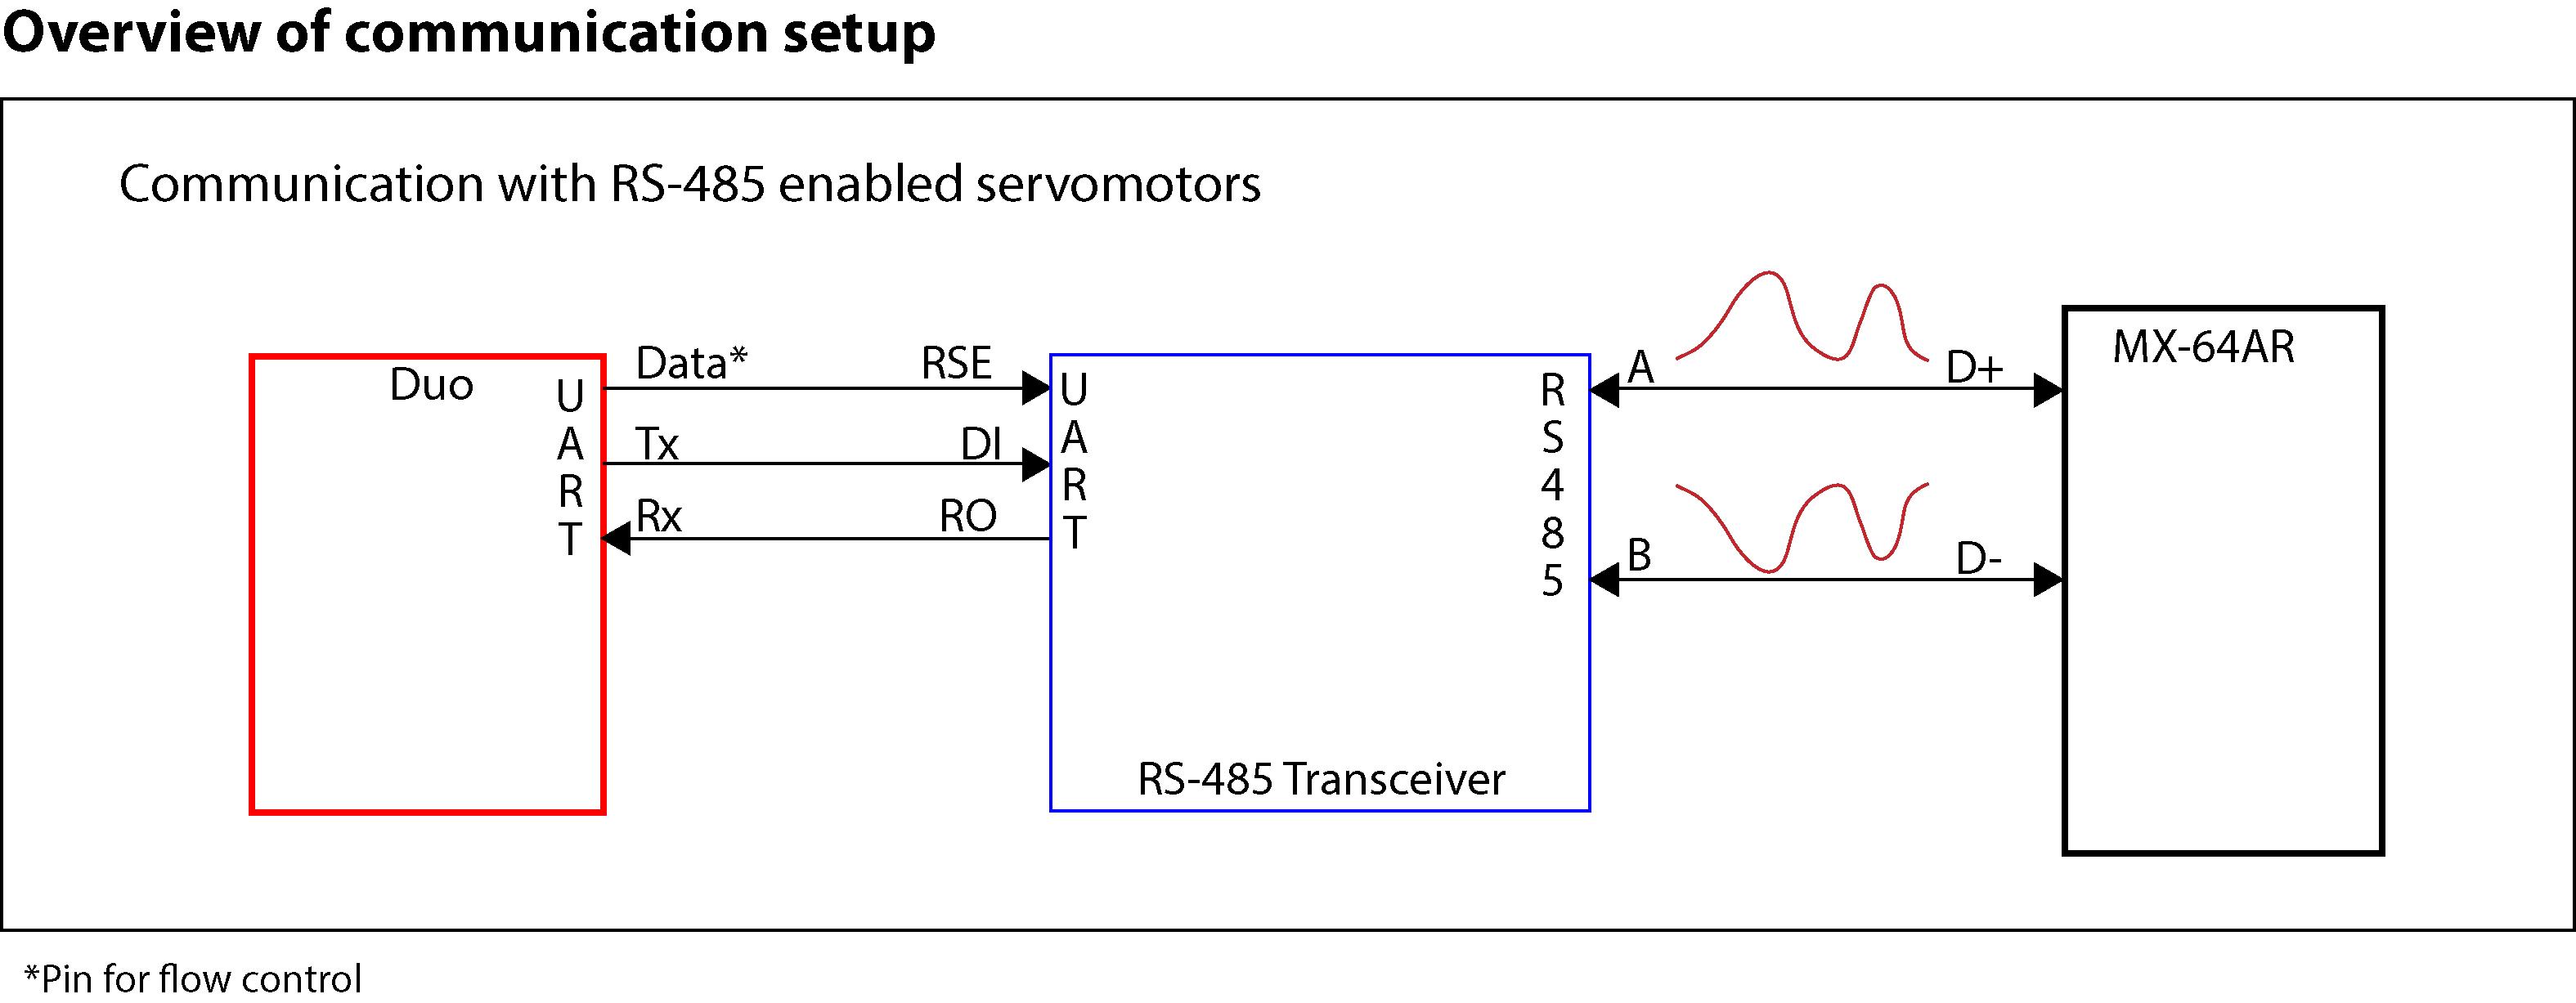 Rs485 Wiring Shield Electrical Diagram 4 Wire Duo Rs 485 Duodmxl Rh Fabreyesmecha Github Io Nmea 0183